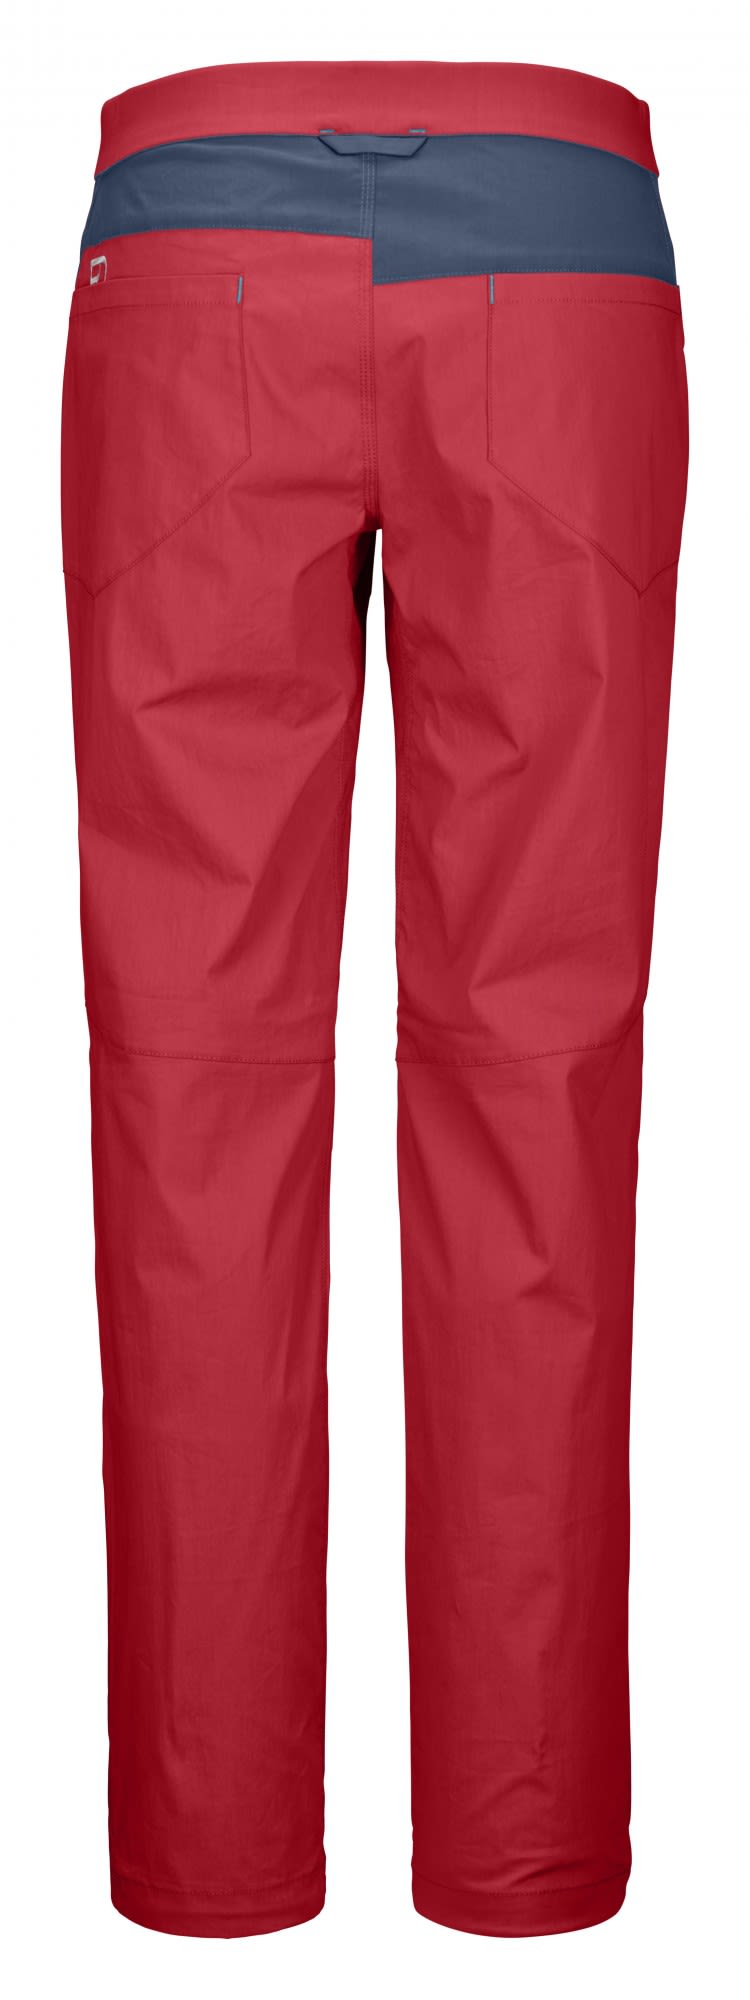 Ortovox Merino Shield Canvas Light Colodri Pants Rot, Female Merino Hose, S